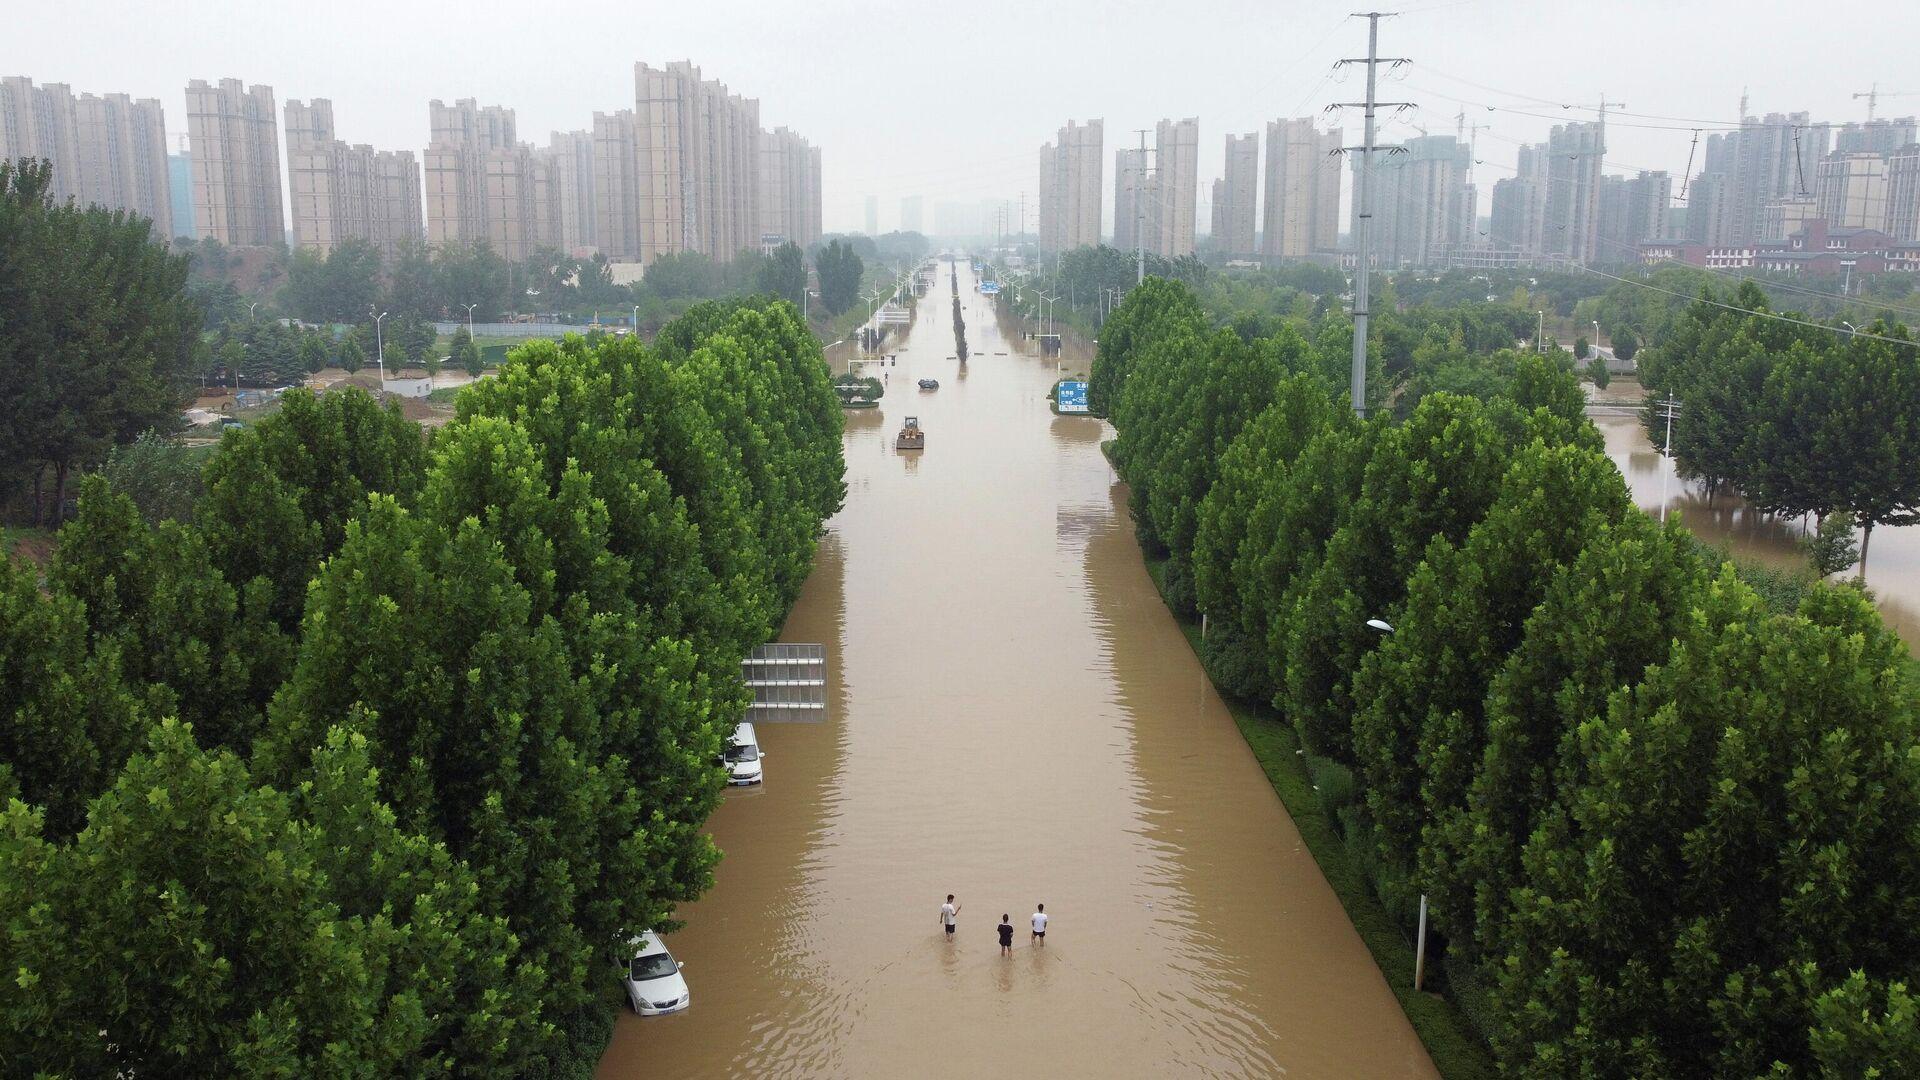 Inundaciones en China - Sputnik Mundo, 1920, 29.07.2021